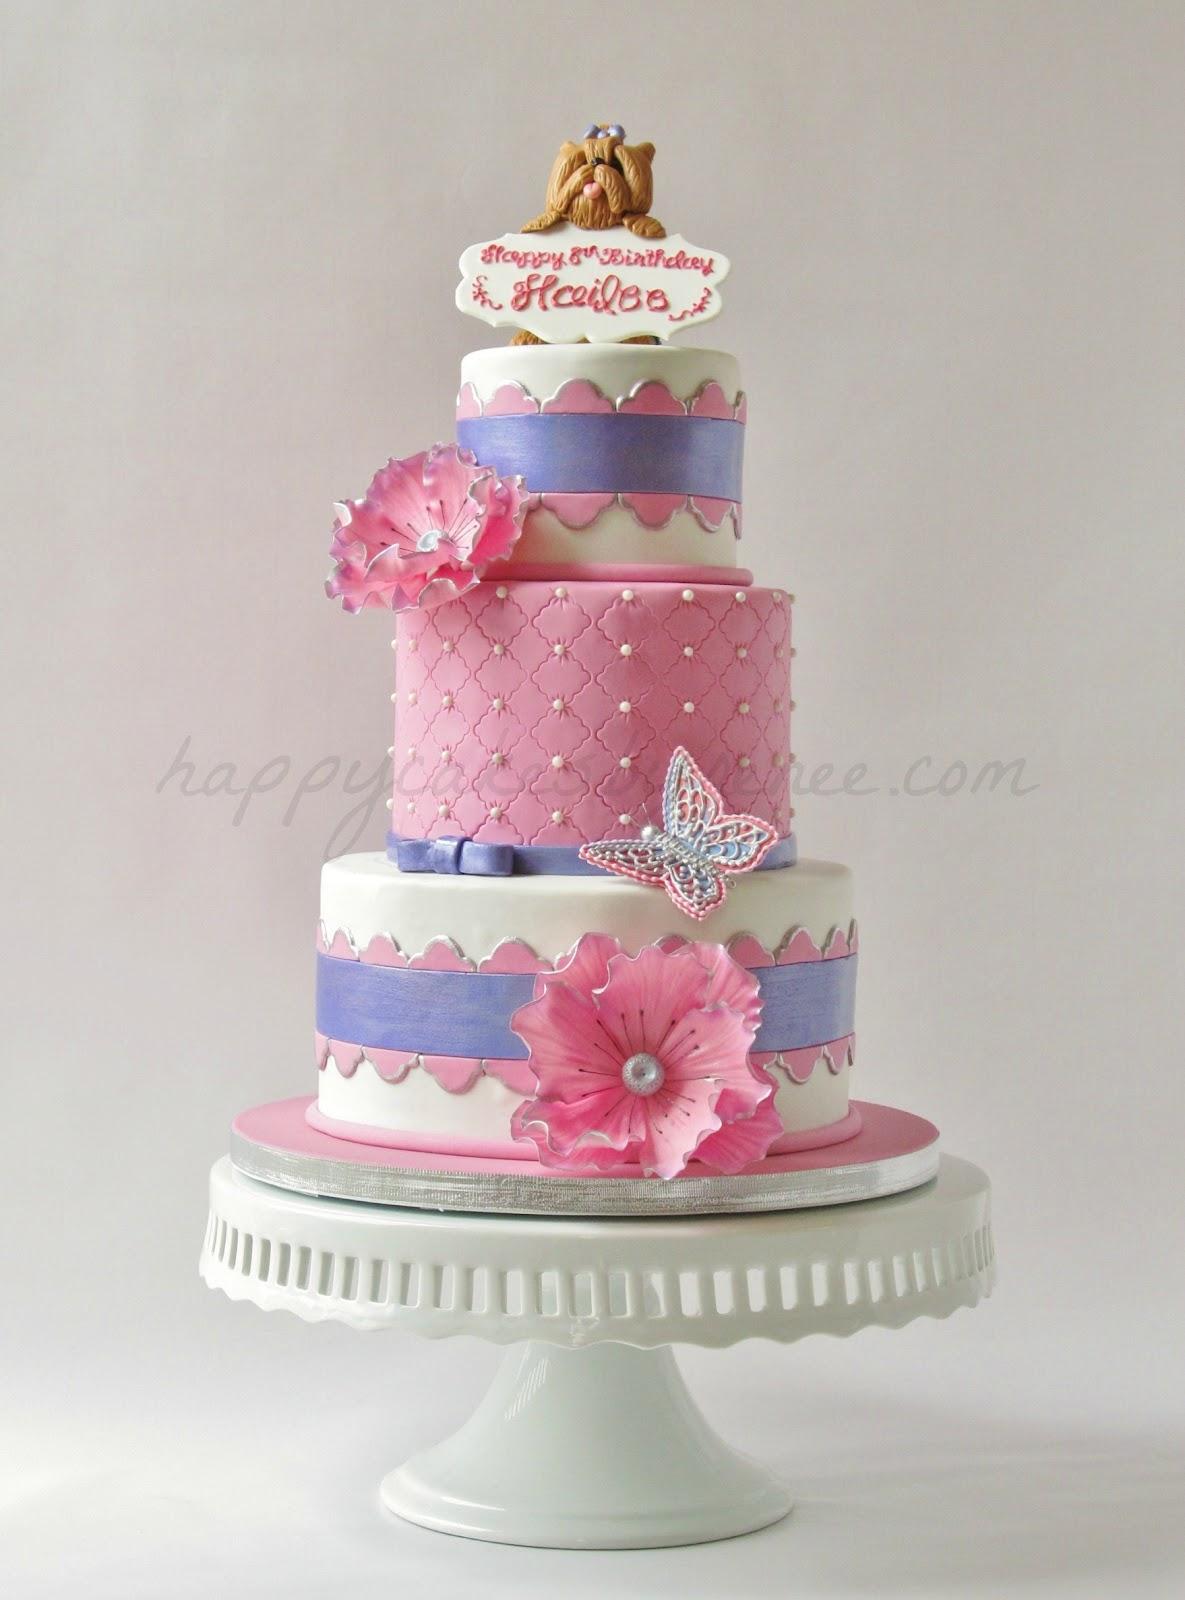 Icing Smiles Renee Conner Cake Design